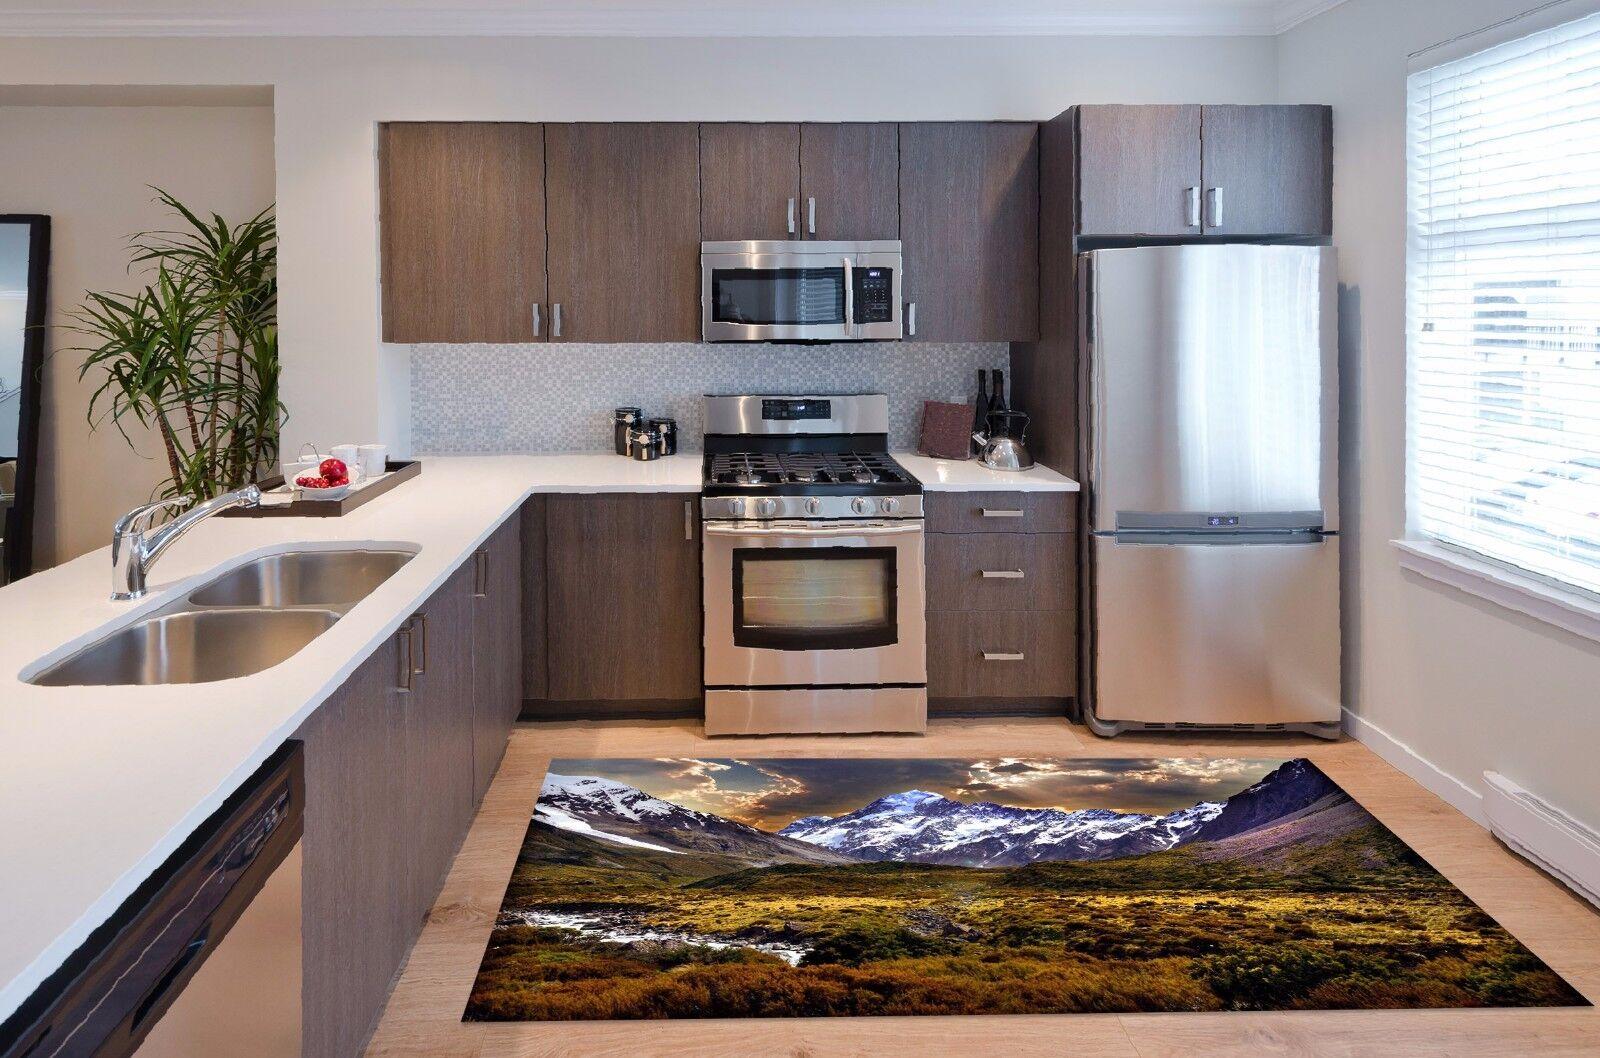 3D Mountain Lawn 6 Kitchen Mat Floor Murals Wall Print Wall AJ WALLPAPER UK Kyra